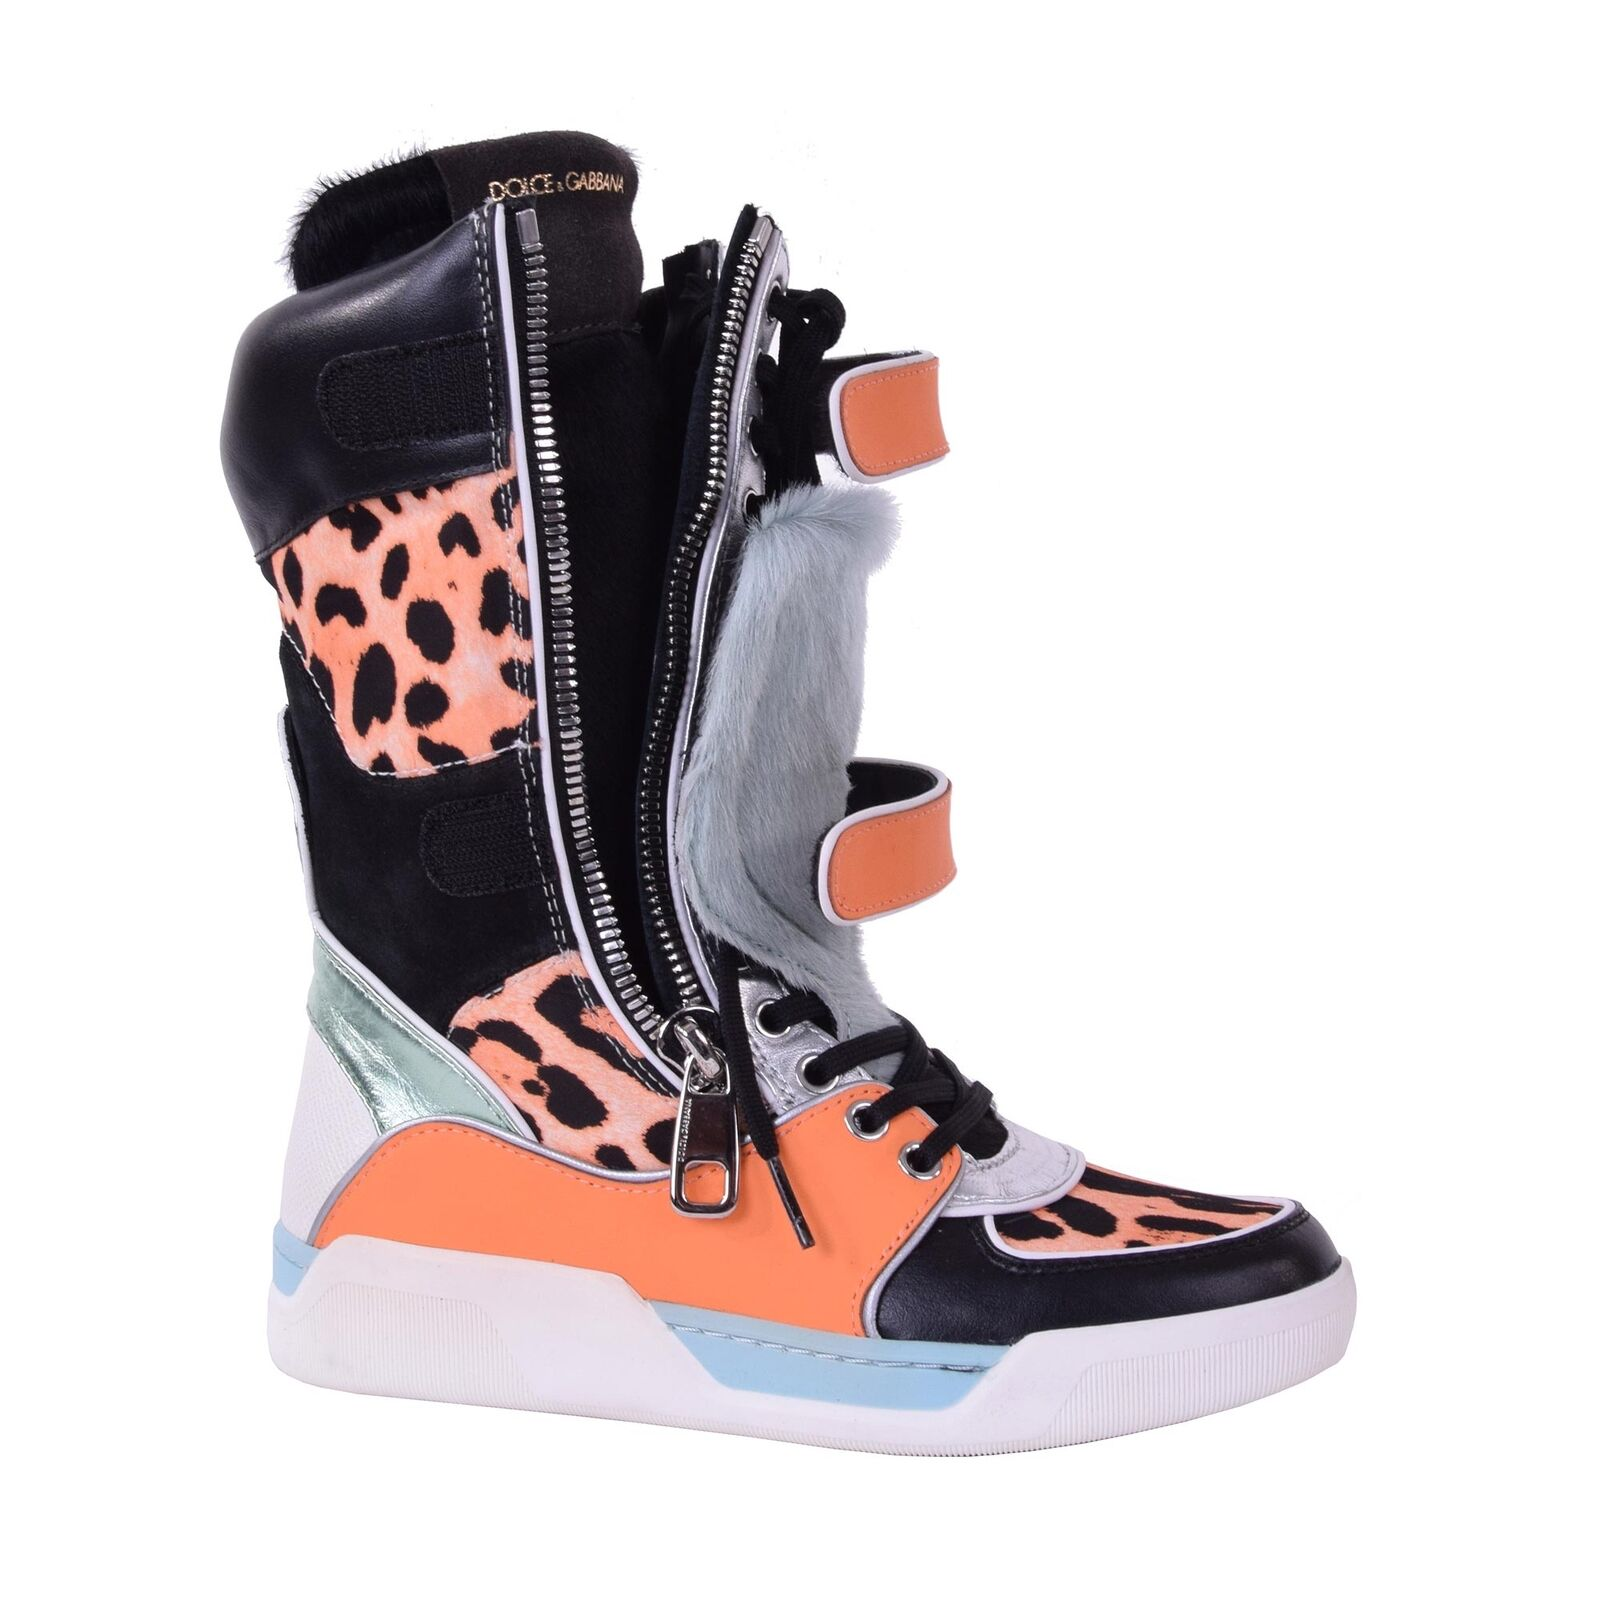 DOLCE & GABBANA Patchwork Pelz Leo High-Top Sneaker Stiefel Stiefel 05874 Orange 05874 Stiefel 1d25f1